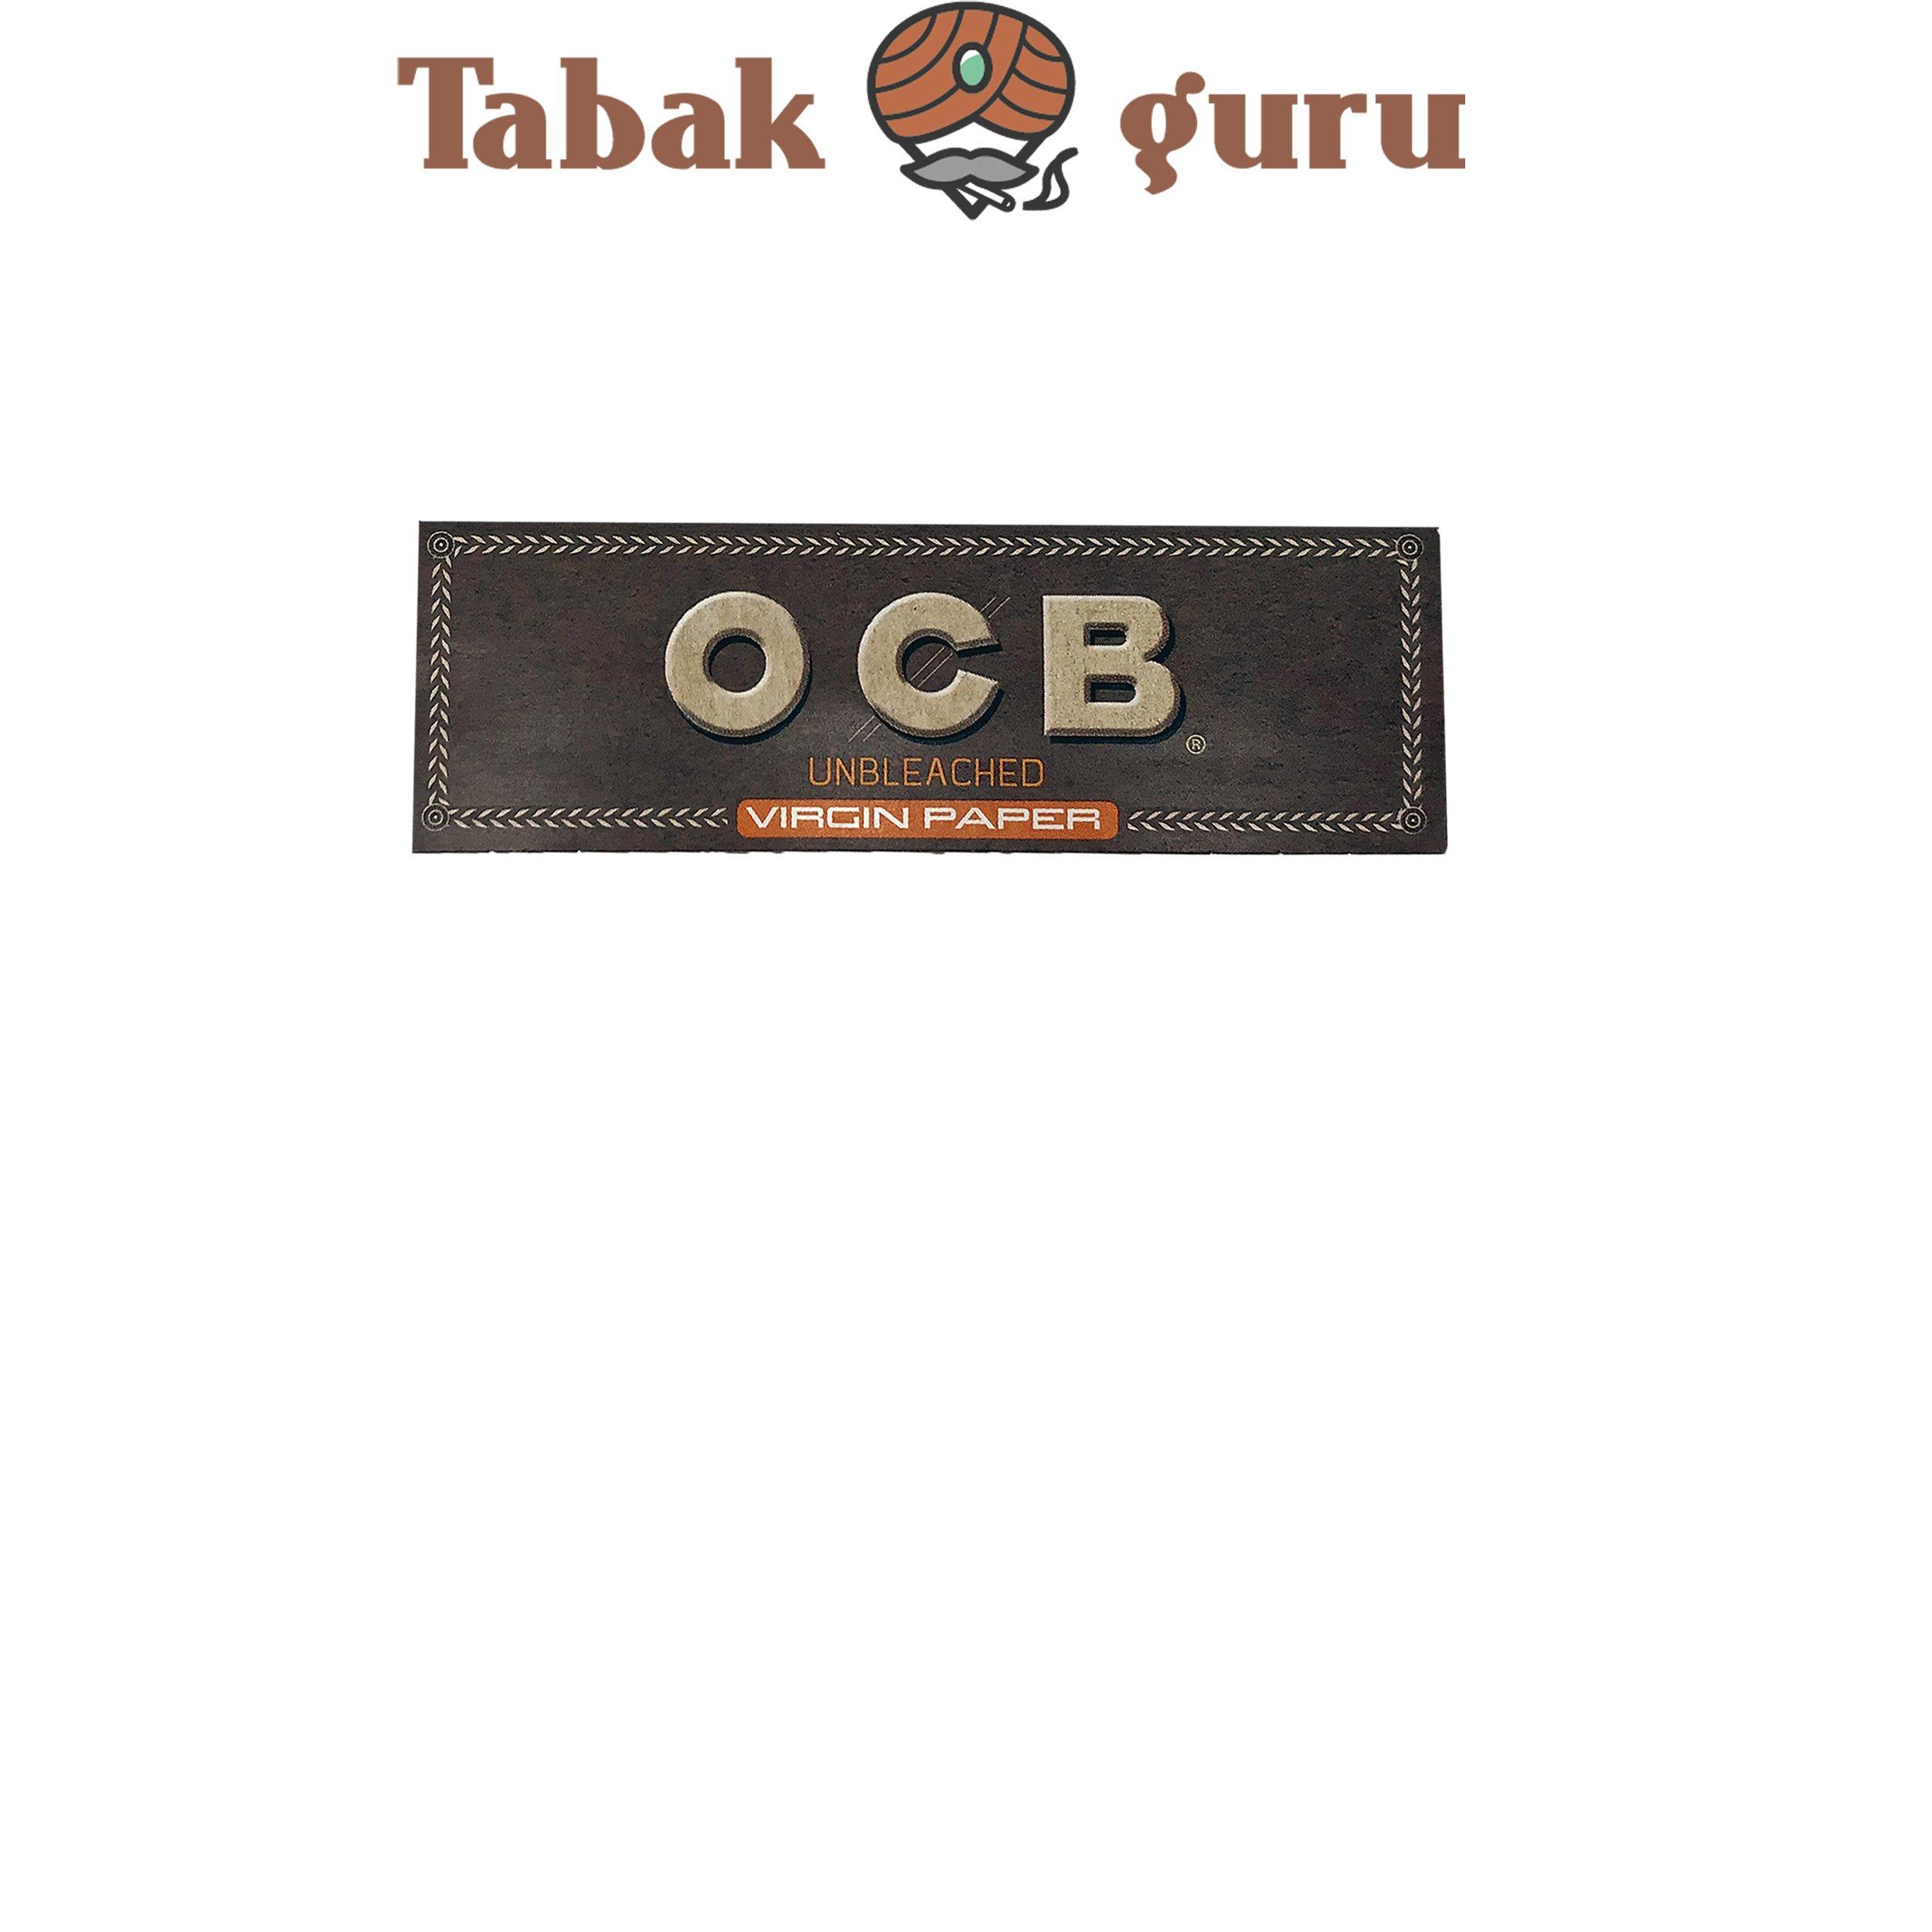 OCB Unbleached Virgin Paper 1 Stück